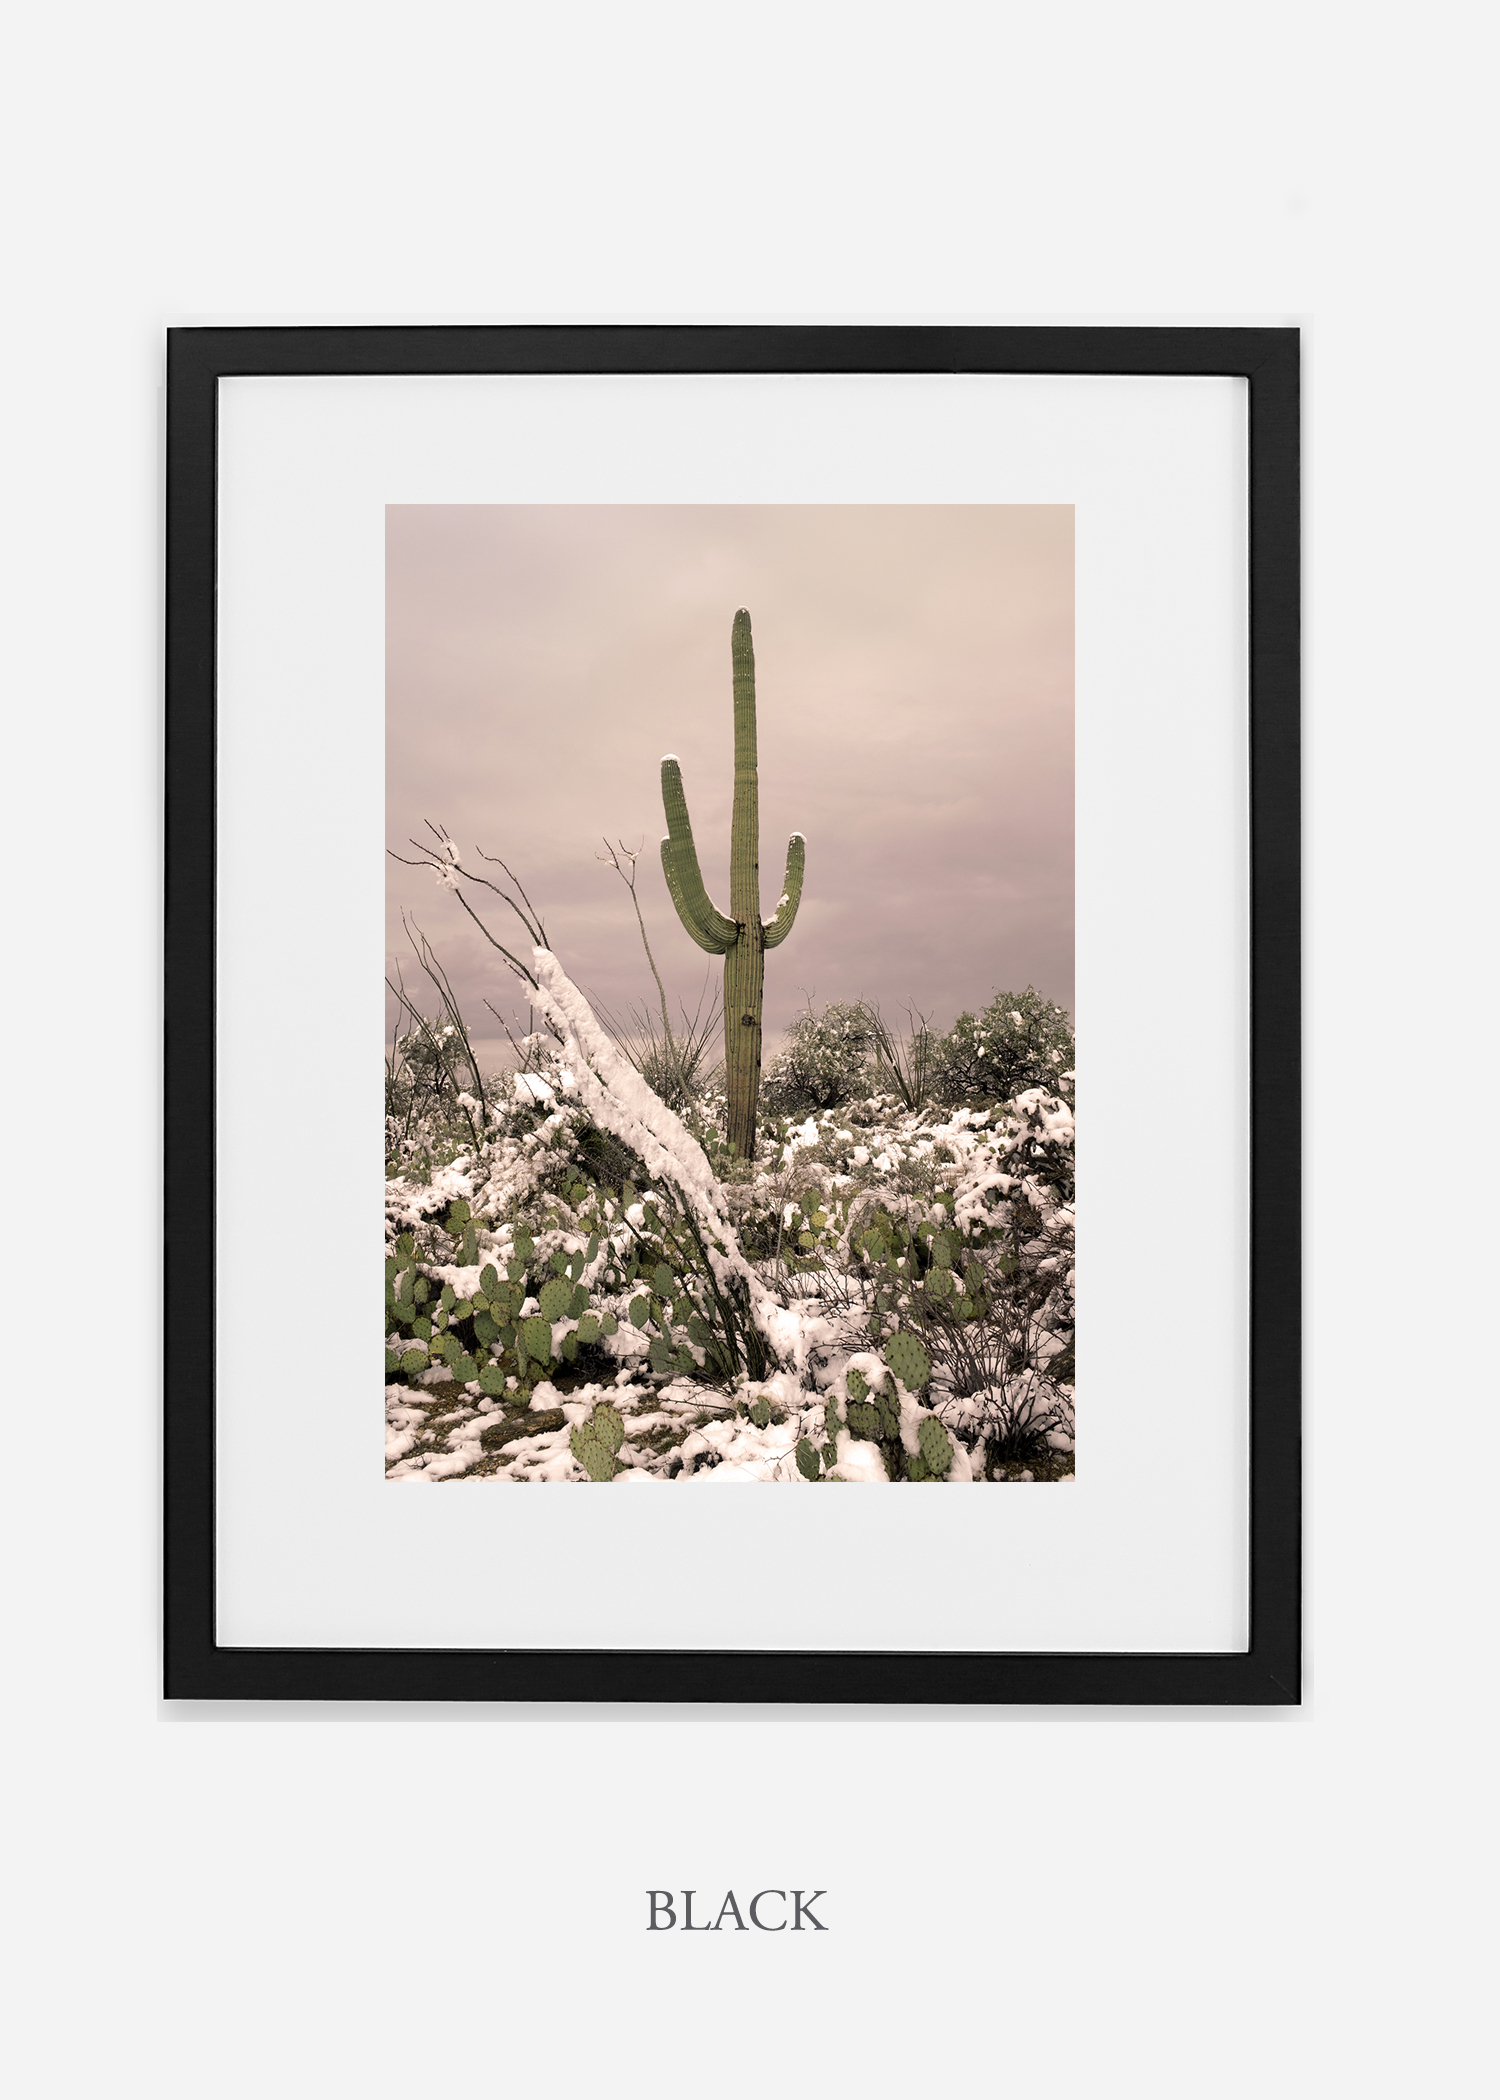 blackframe-saguaroNo.4-wildercalifornia-art-wallart-cactusprint-homedecor-prints-arizona-botanical-artwork-interiordesign.jpg